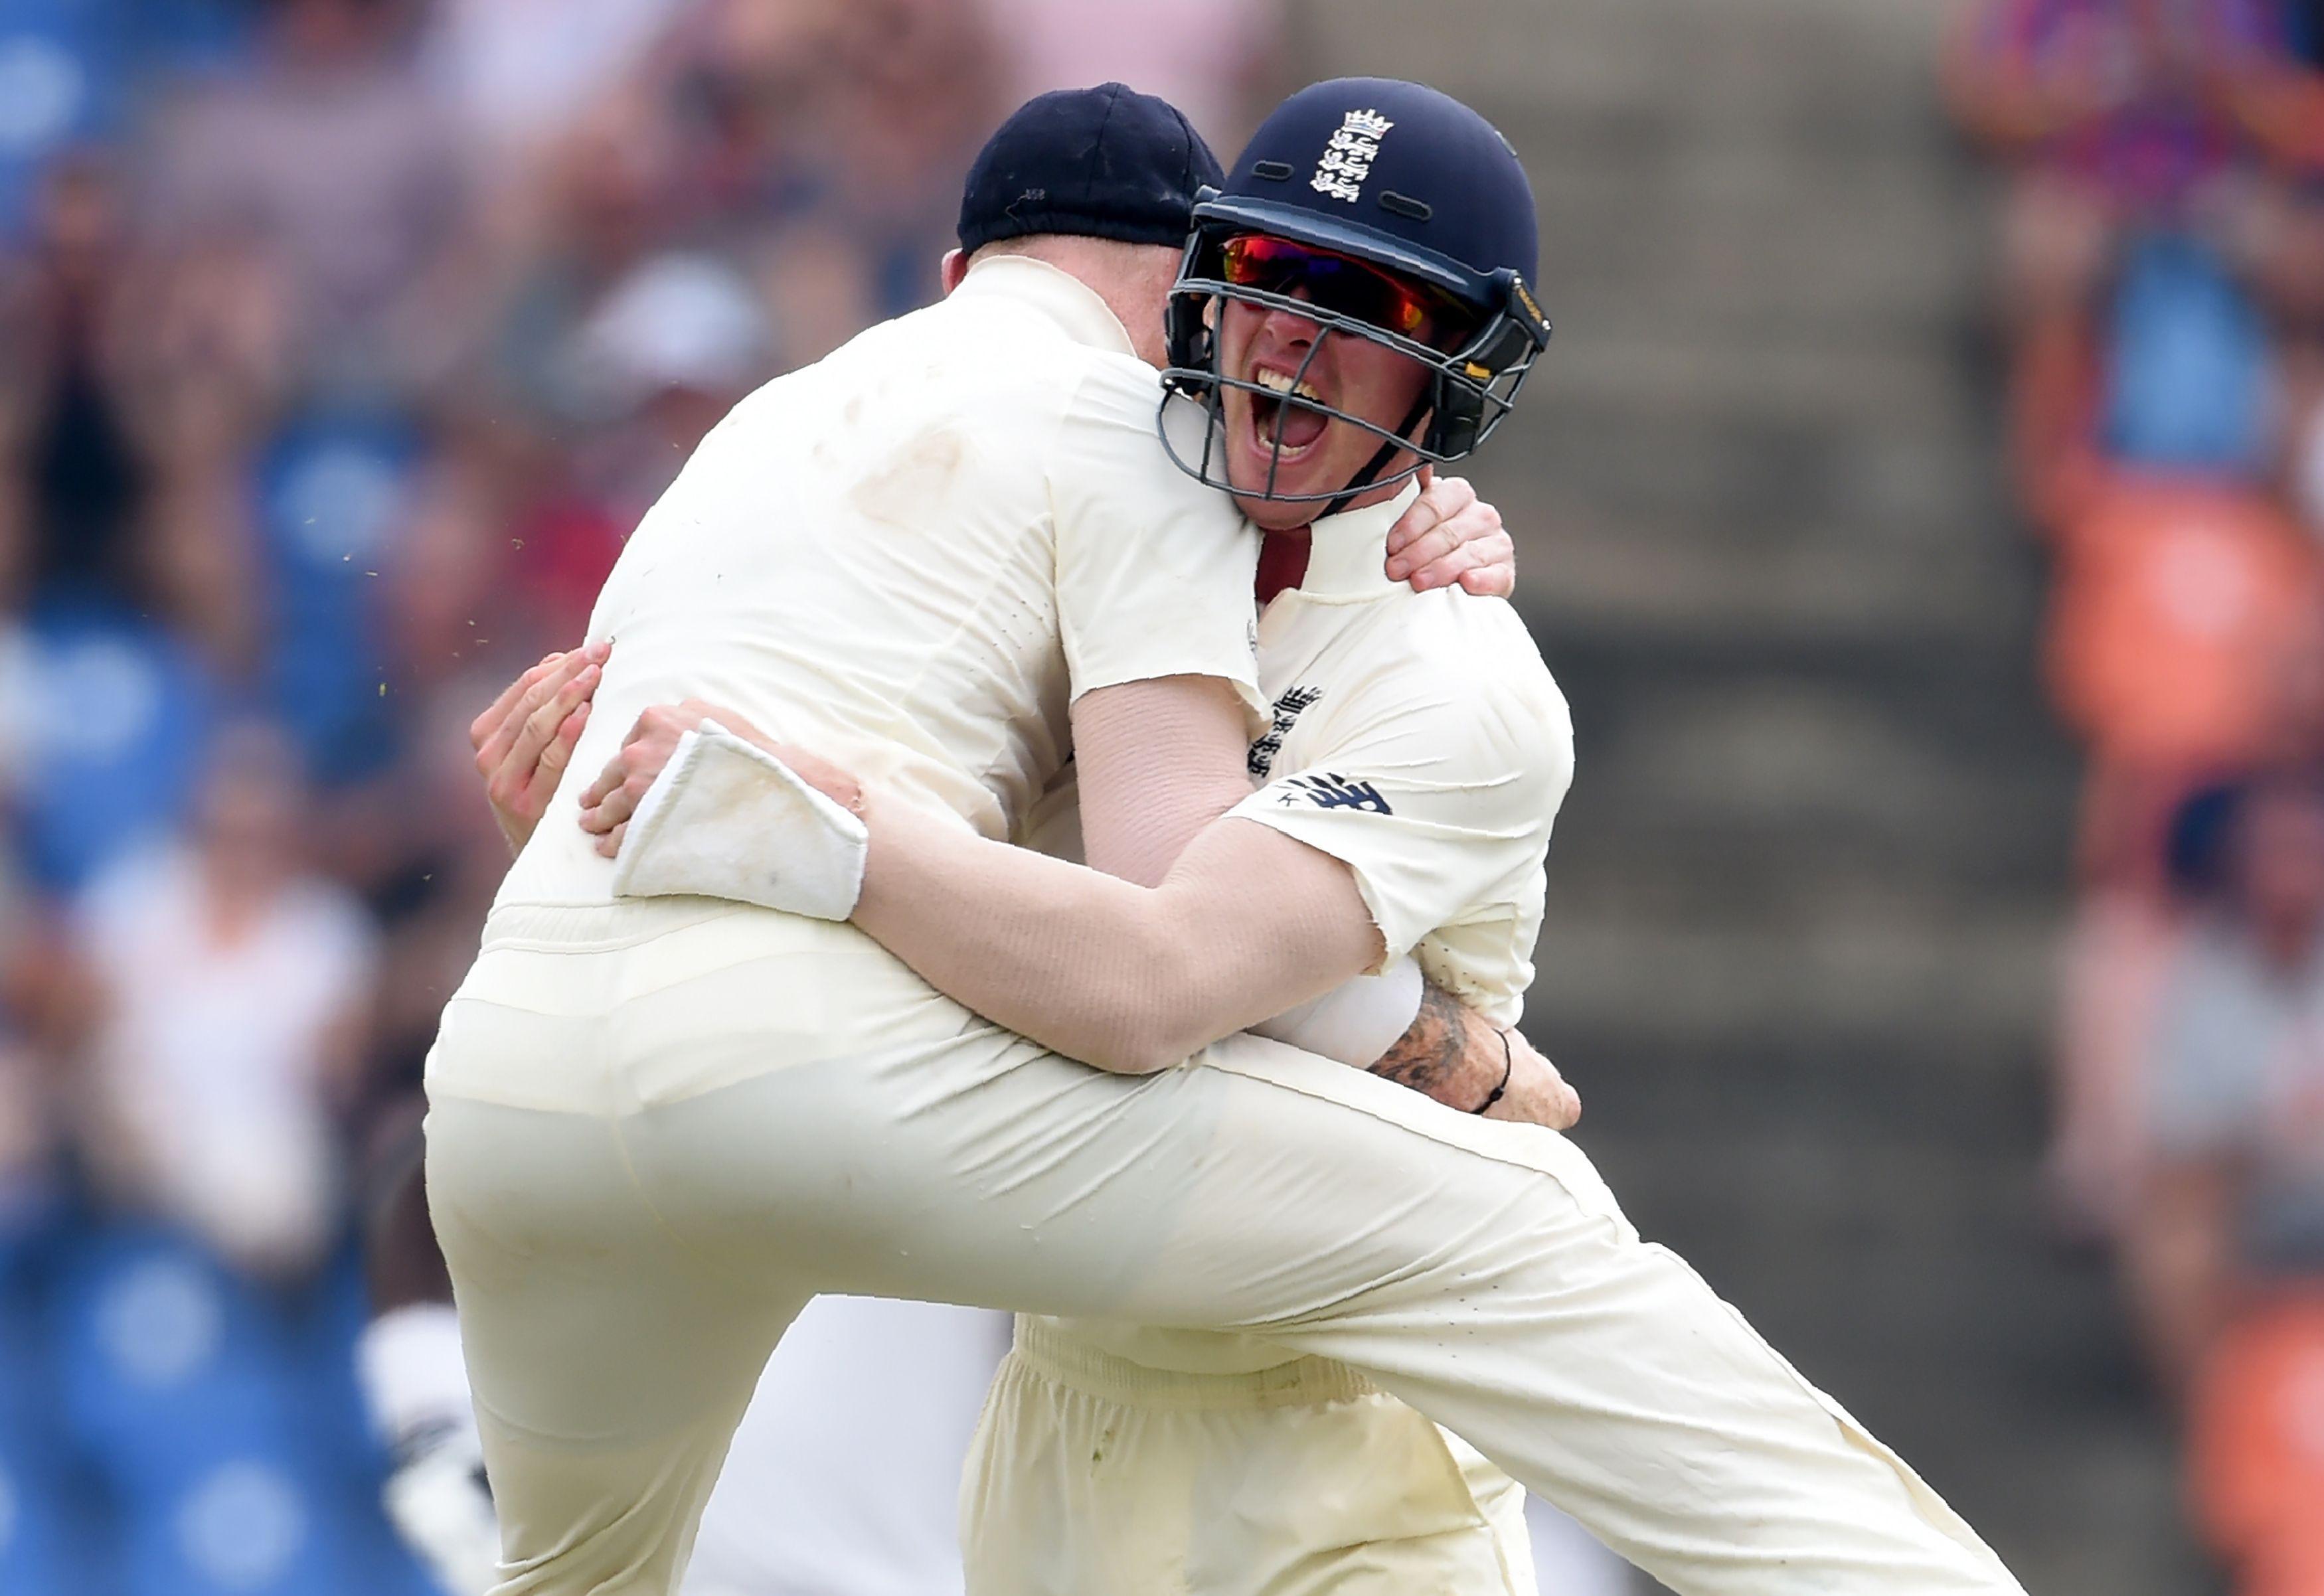 Keaton Jennings, right, celebrates with Ben Stokes after dismissing Sri Lanka's Dimuth Karunaratne